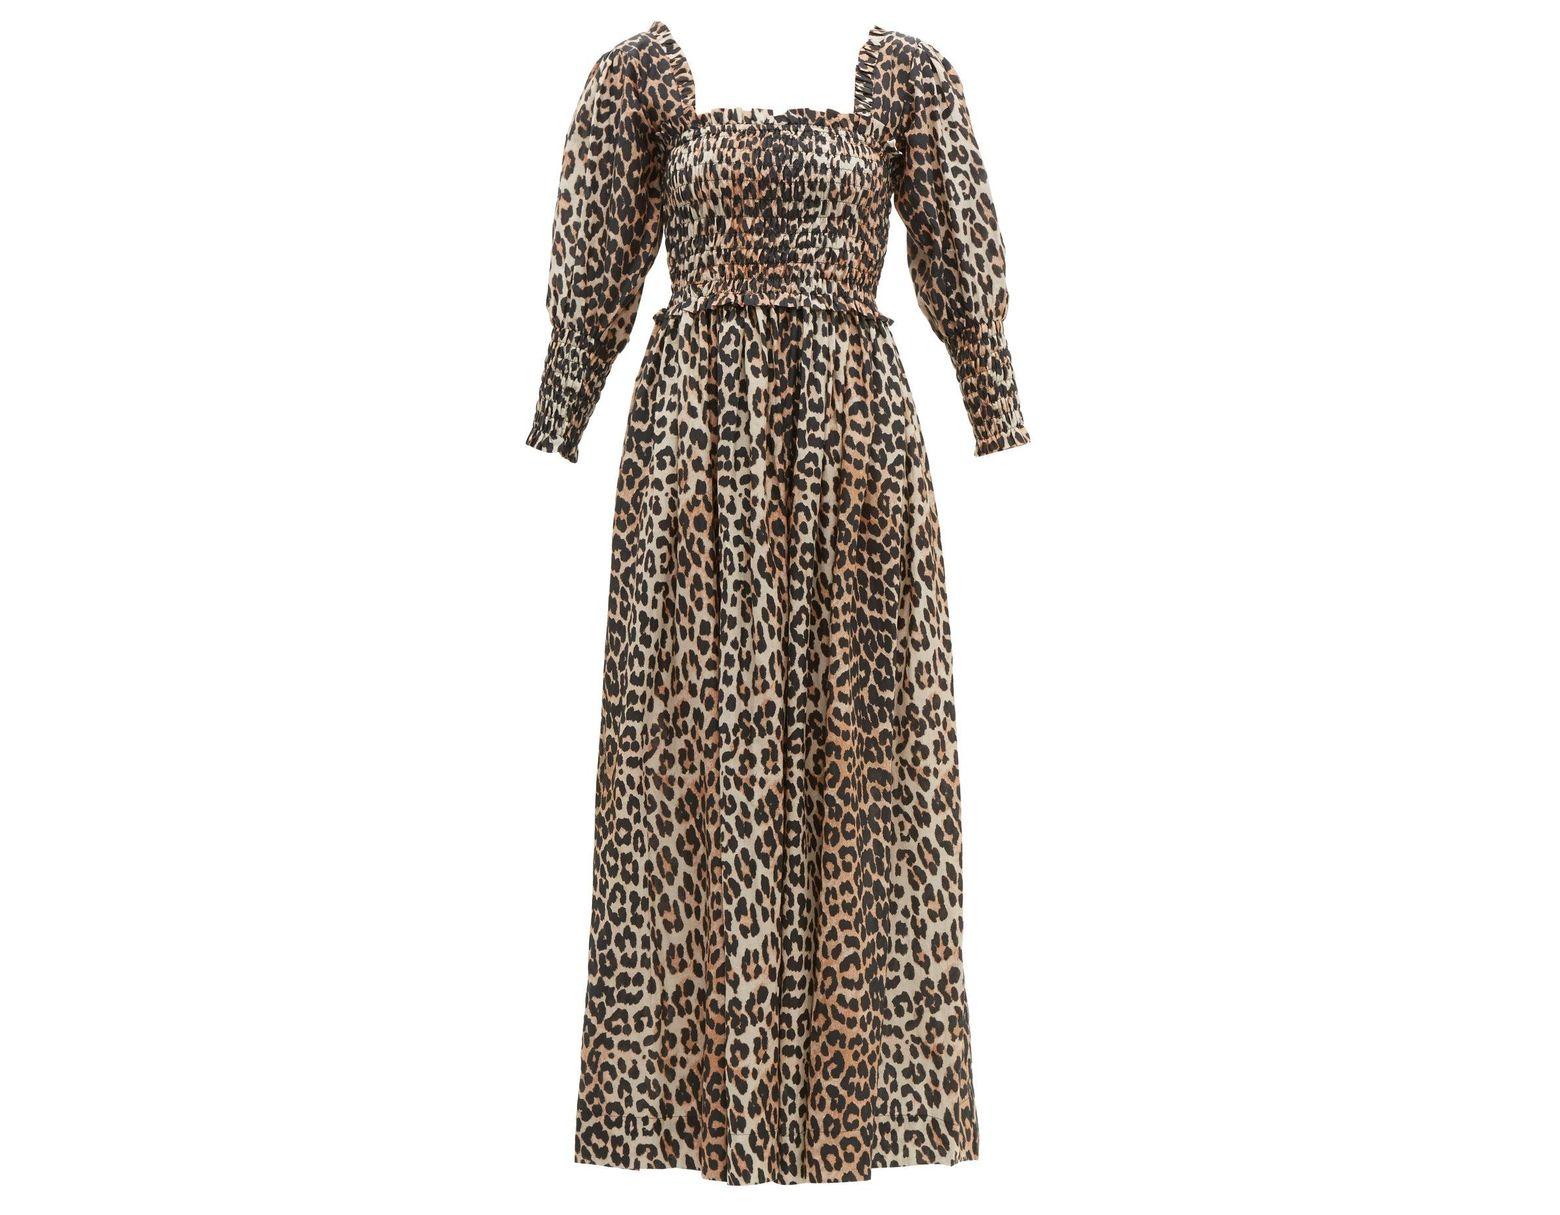 5512f7995e75 Ganni Shirred Leopard Print Cotton Blend Maxi Dress - Lyst